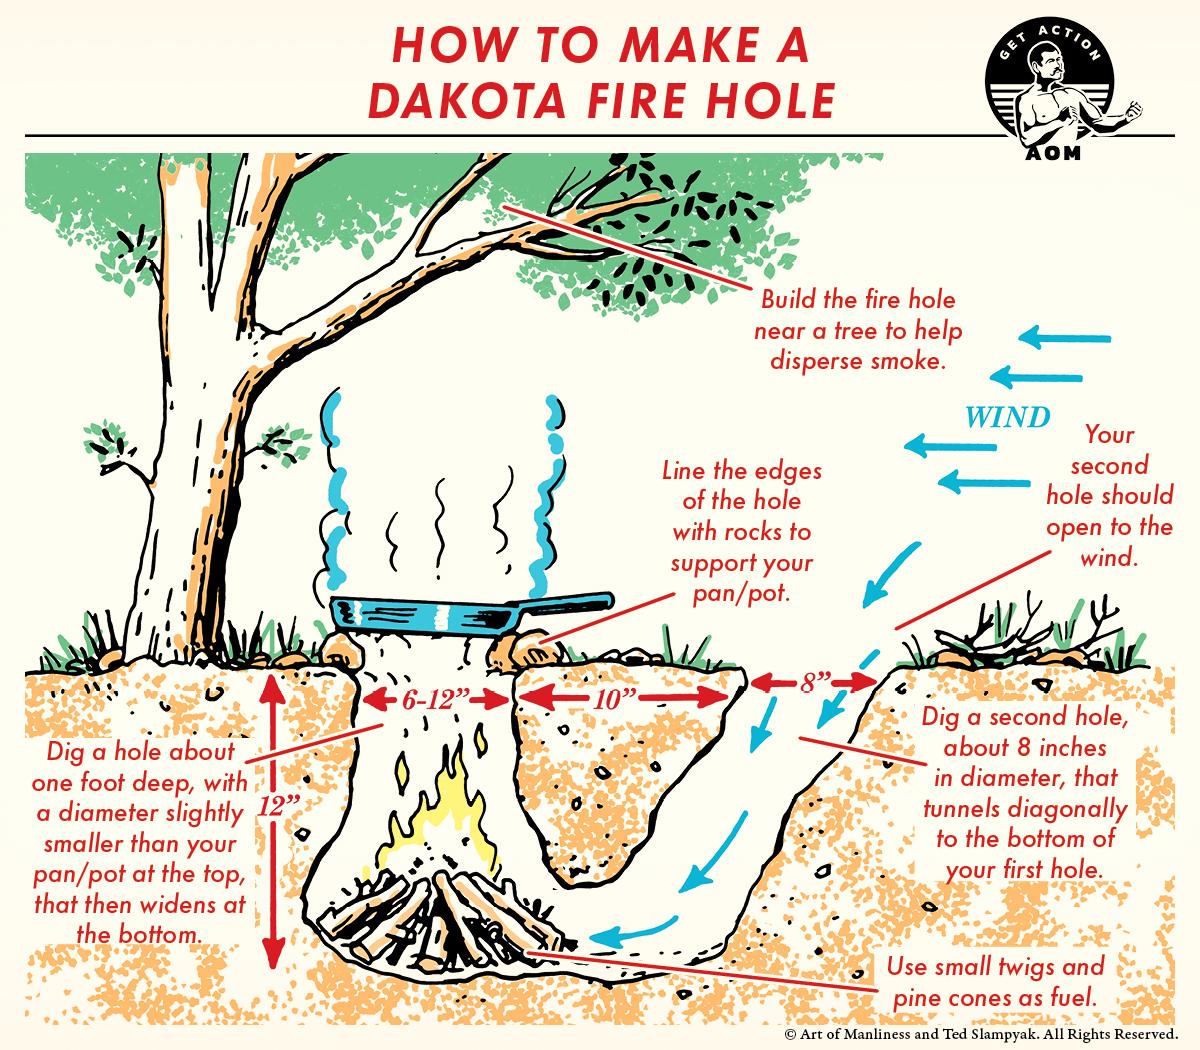 How to make a Dakota fire hole illustration diagram.